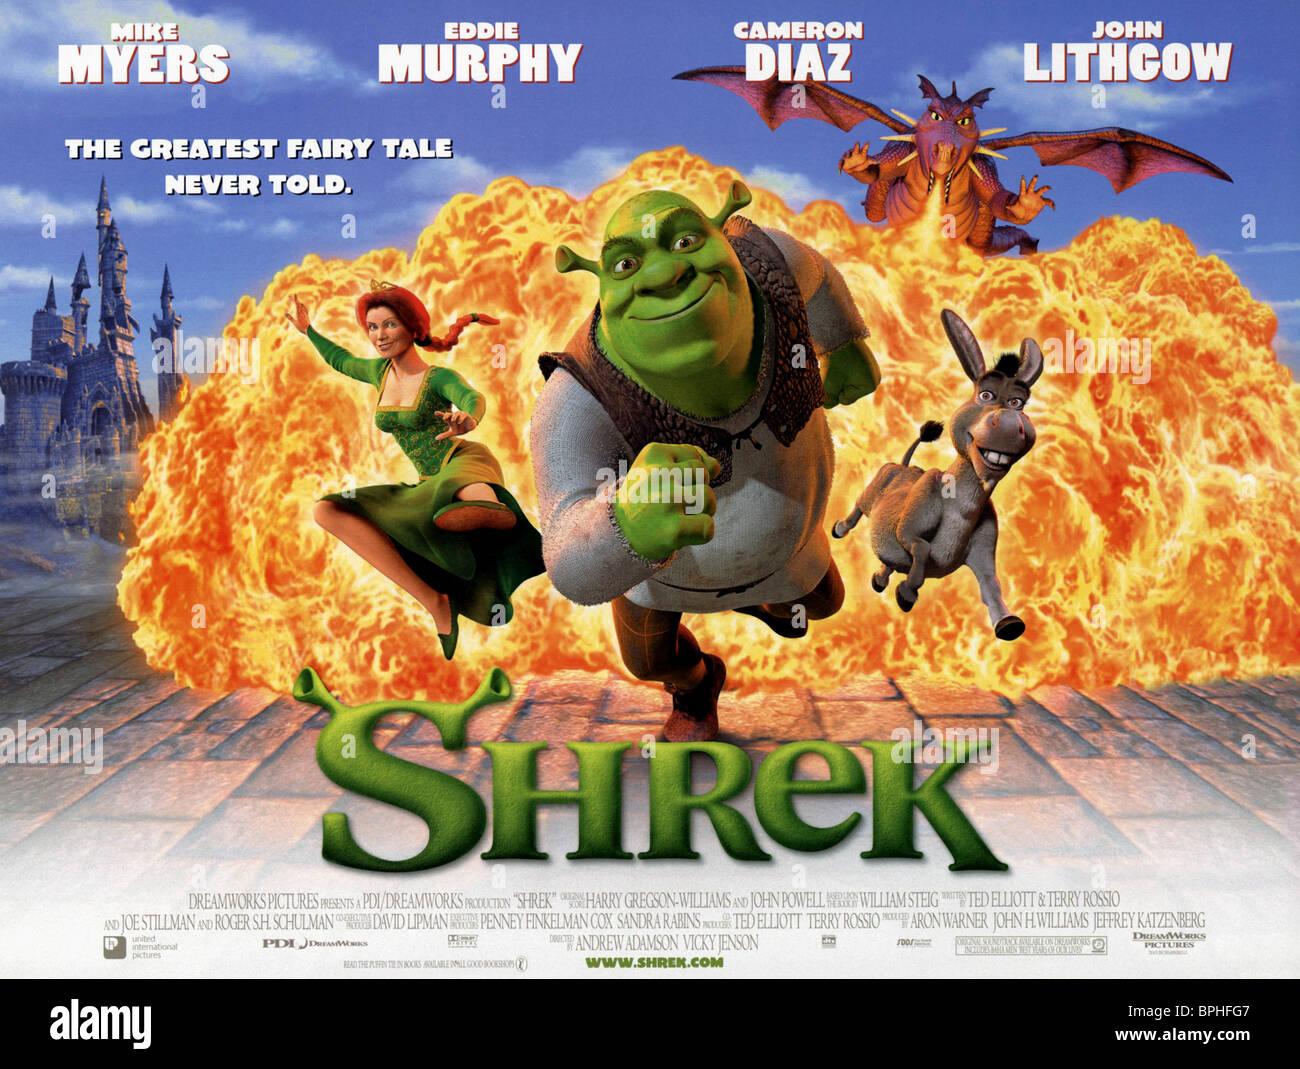 film poster shrek 2001 stock photo royalty free image